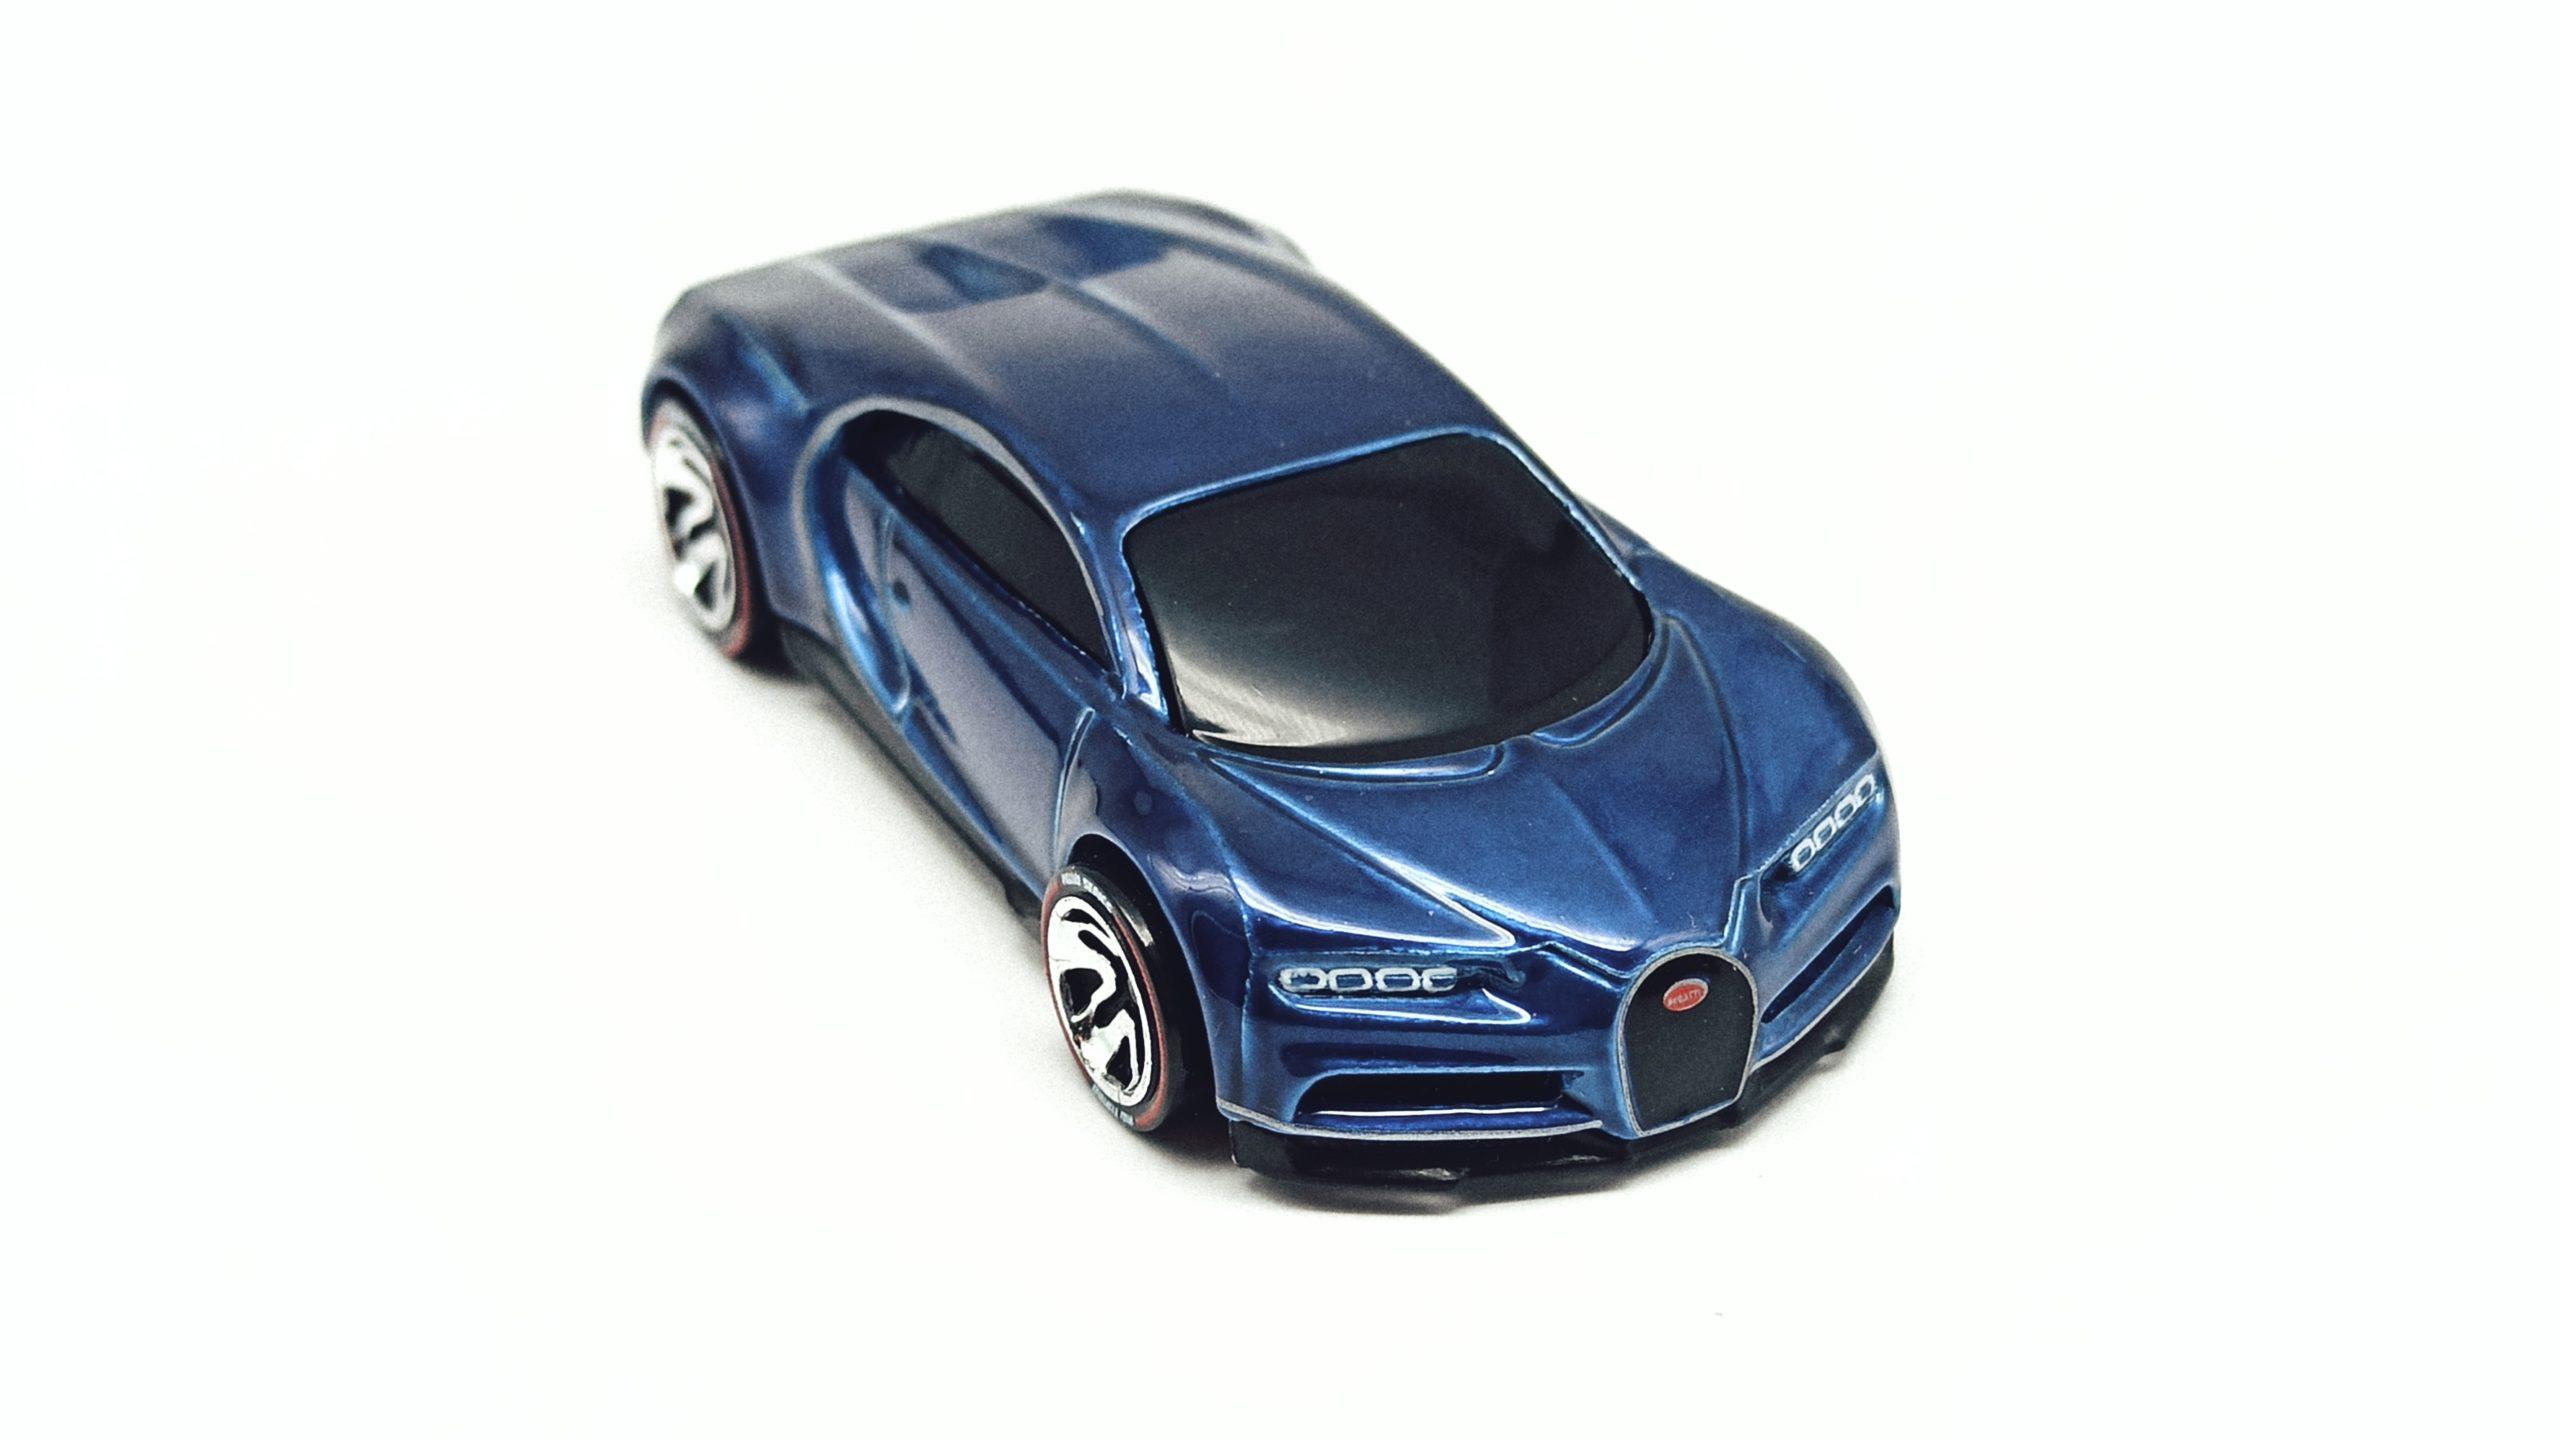 Hot Wheels id '16 Bugatti Chiron (HBG00) 2021 HW Turbo (3/4) spectraflame blue top angle